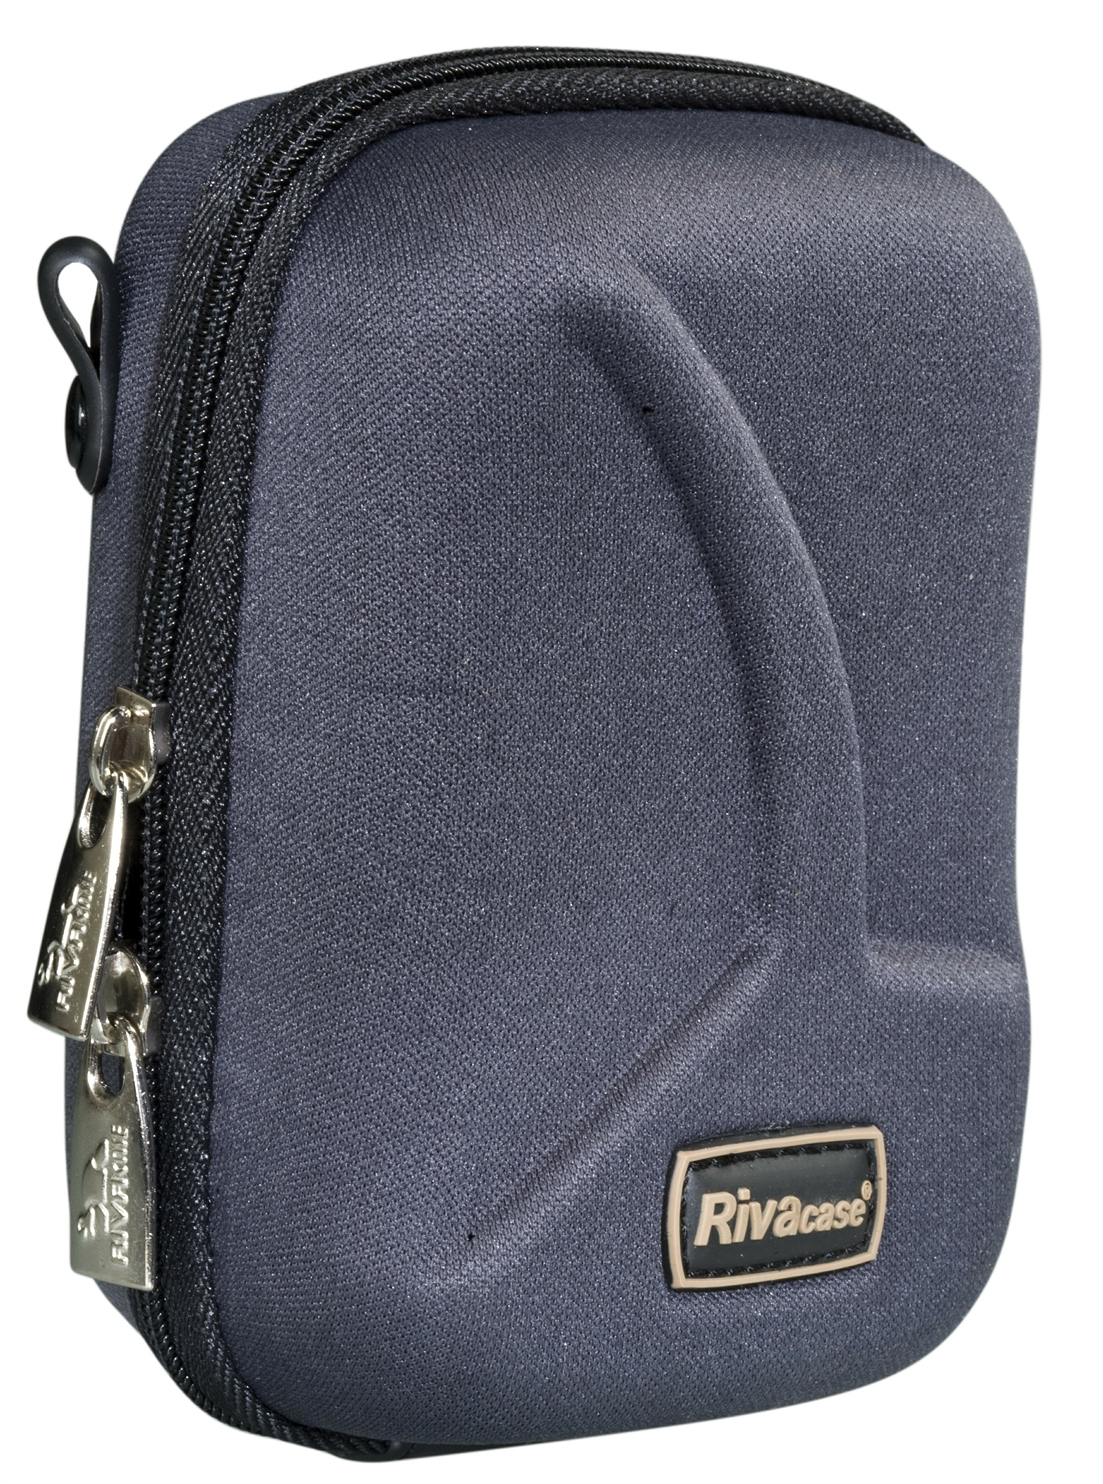 Сумка для фотоаппарата Riva case Real Brand Technics 149.000